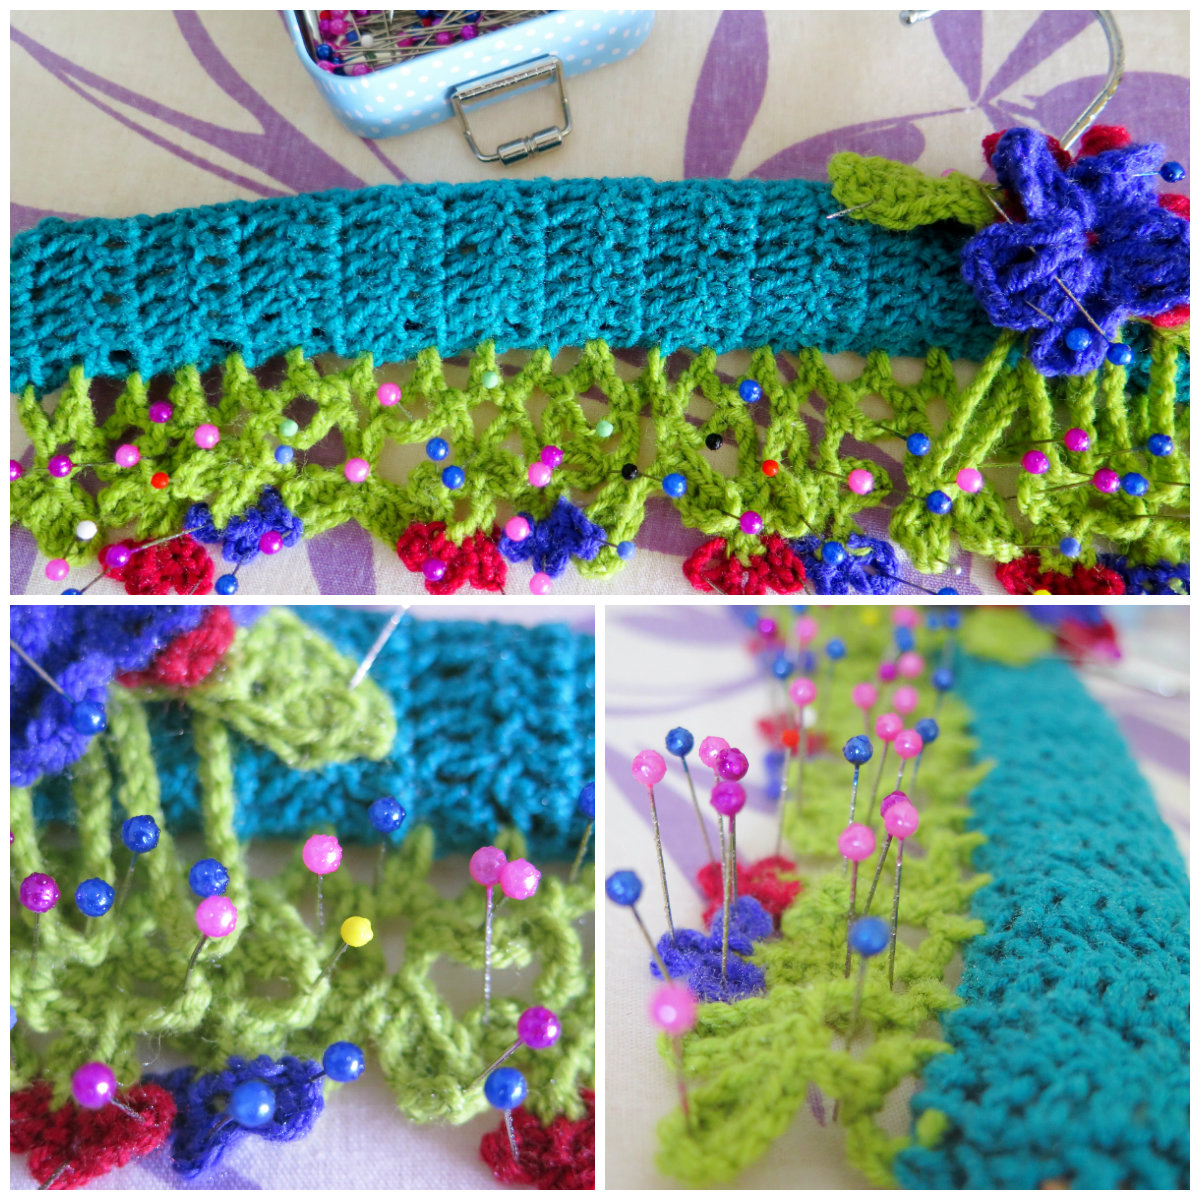 froilein lizzi h kelt kleine vintage geschenke h keln crocheting little vintage presents. Black Bedroom Furniture Sets. Home Design Ideas